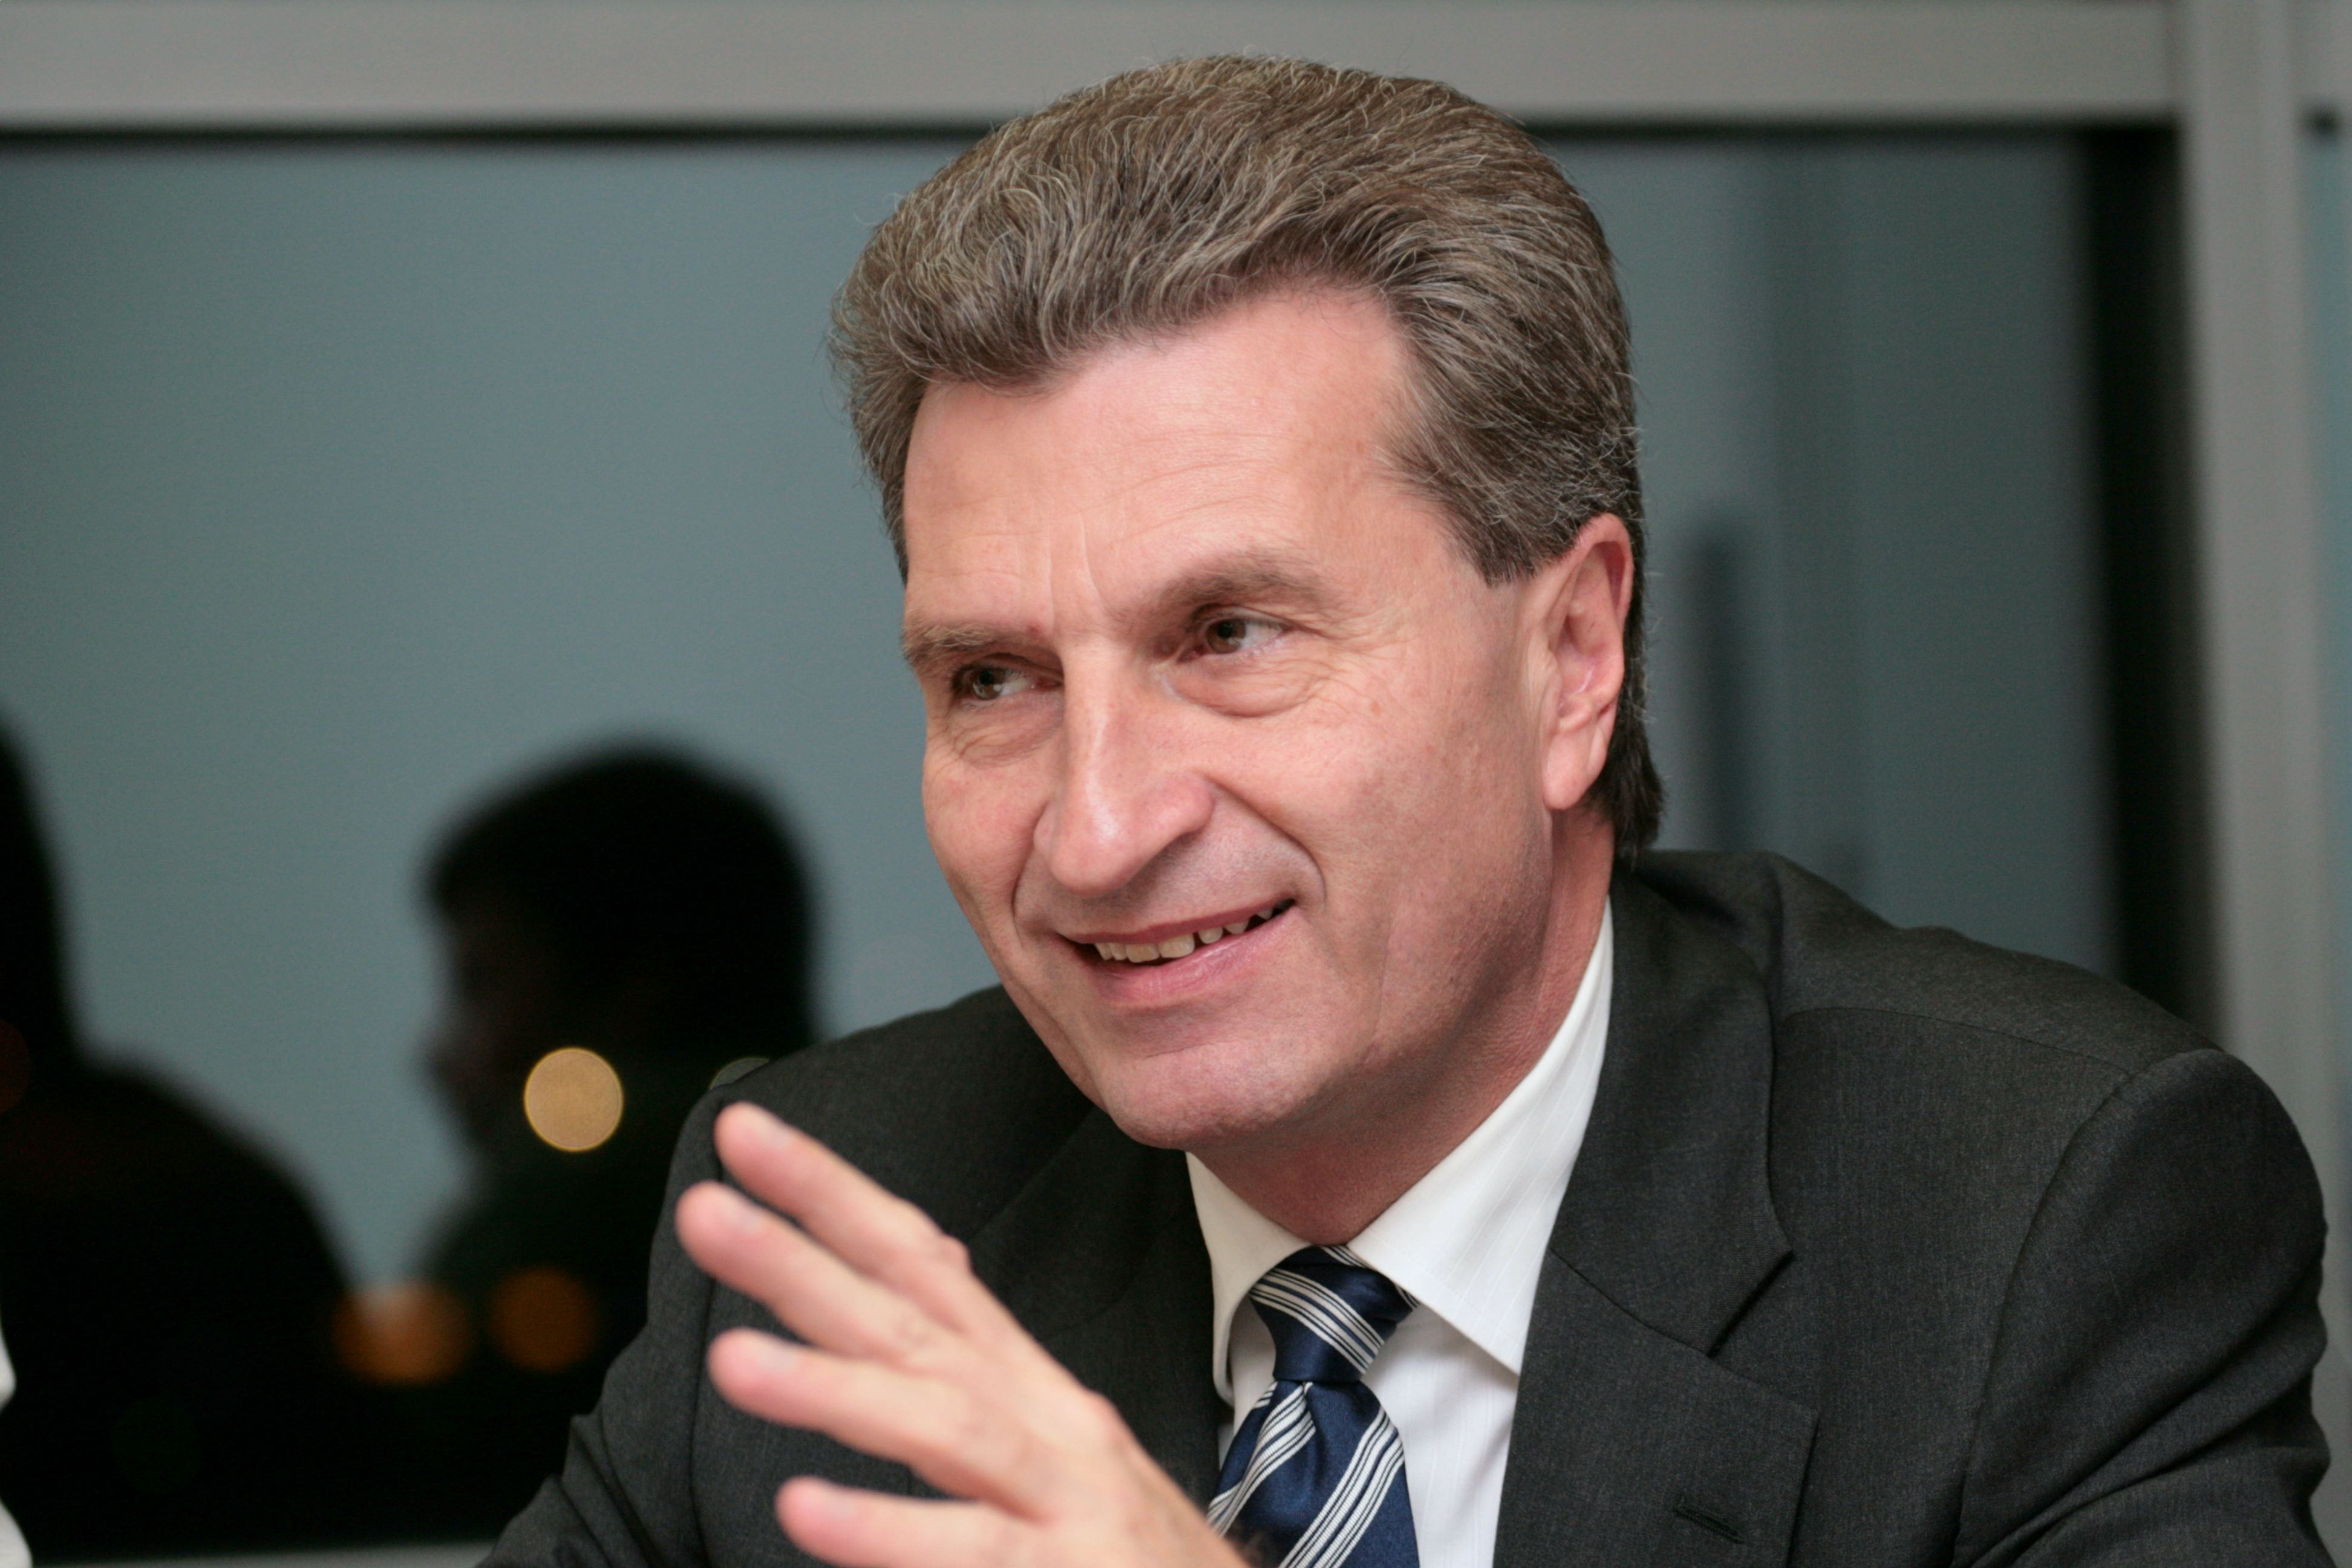 http://www.evwind.com/wp-content/uploads/2013/06/Oettinger-e%C3%B3lica.jpg